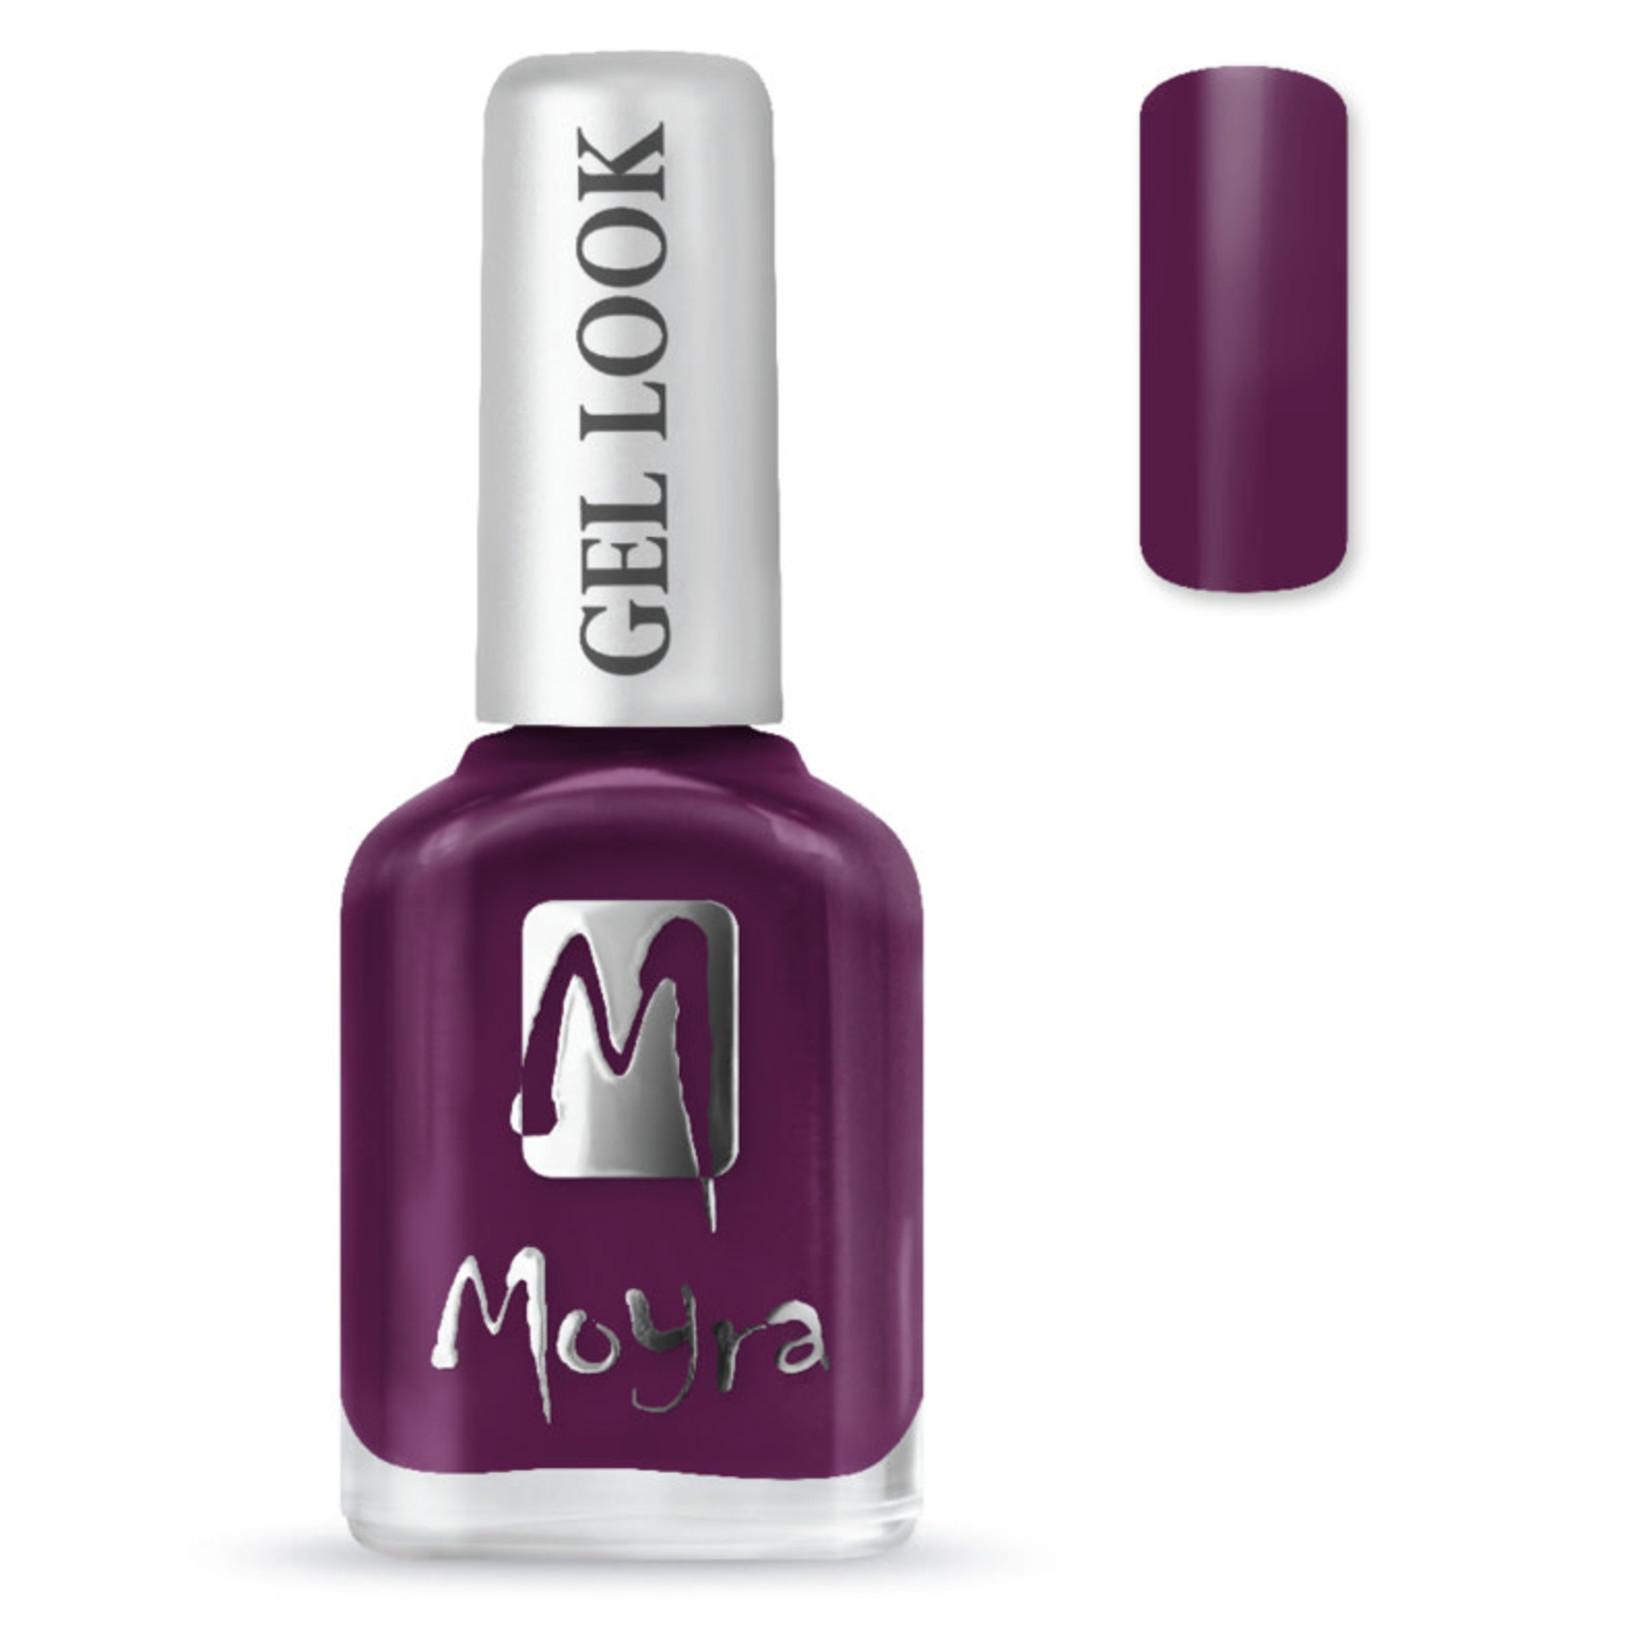 Moyra Moyra Gel Look nail polish 911 Chloé